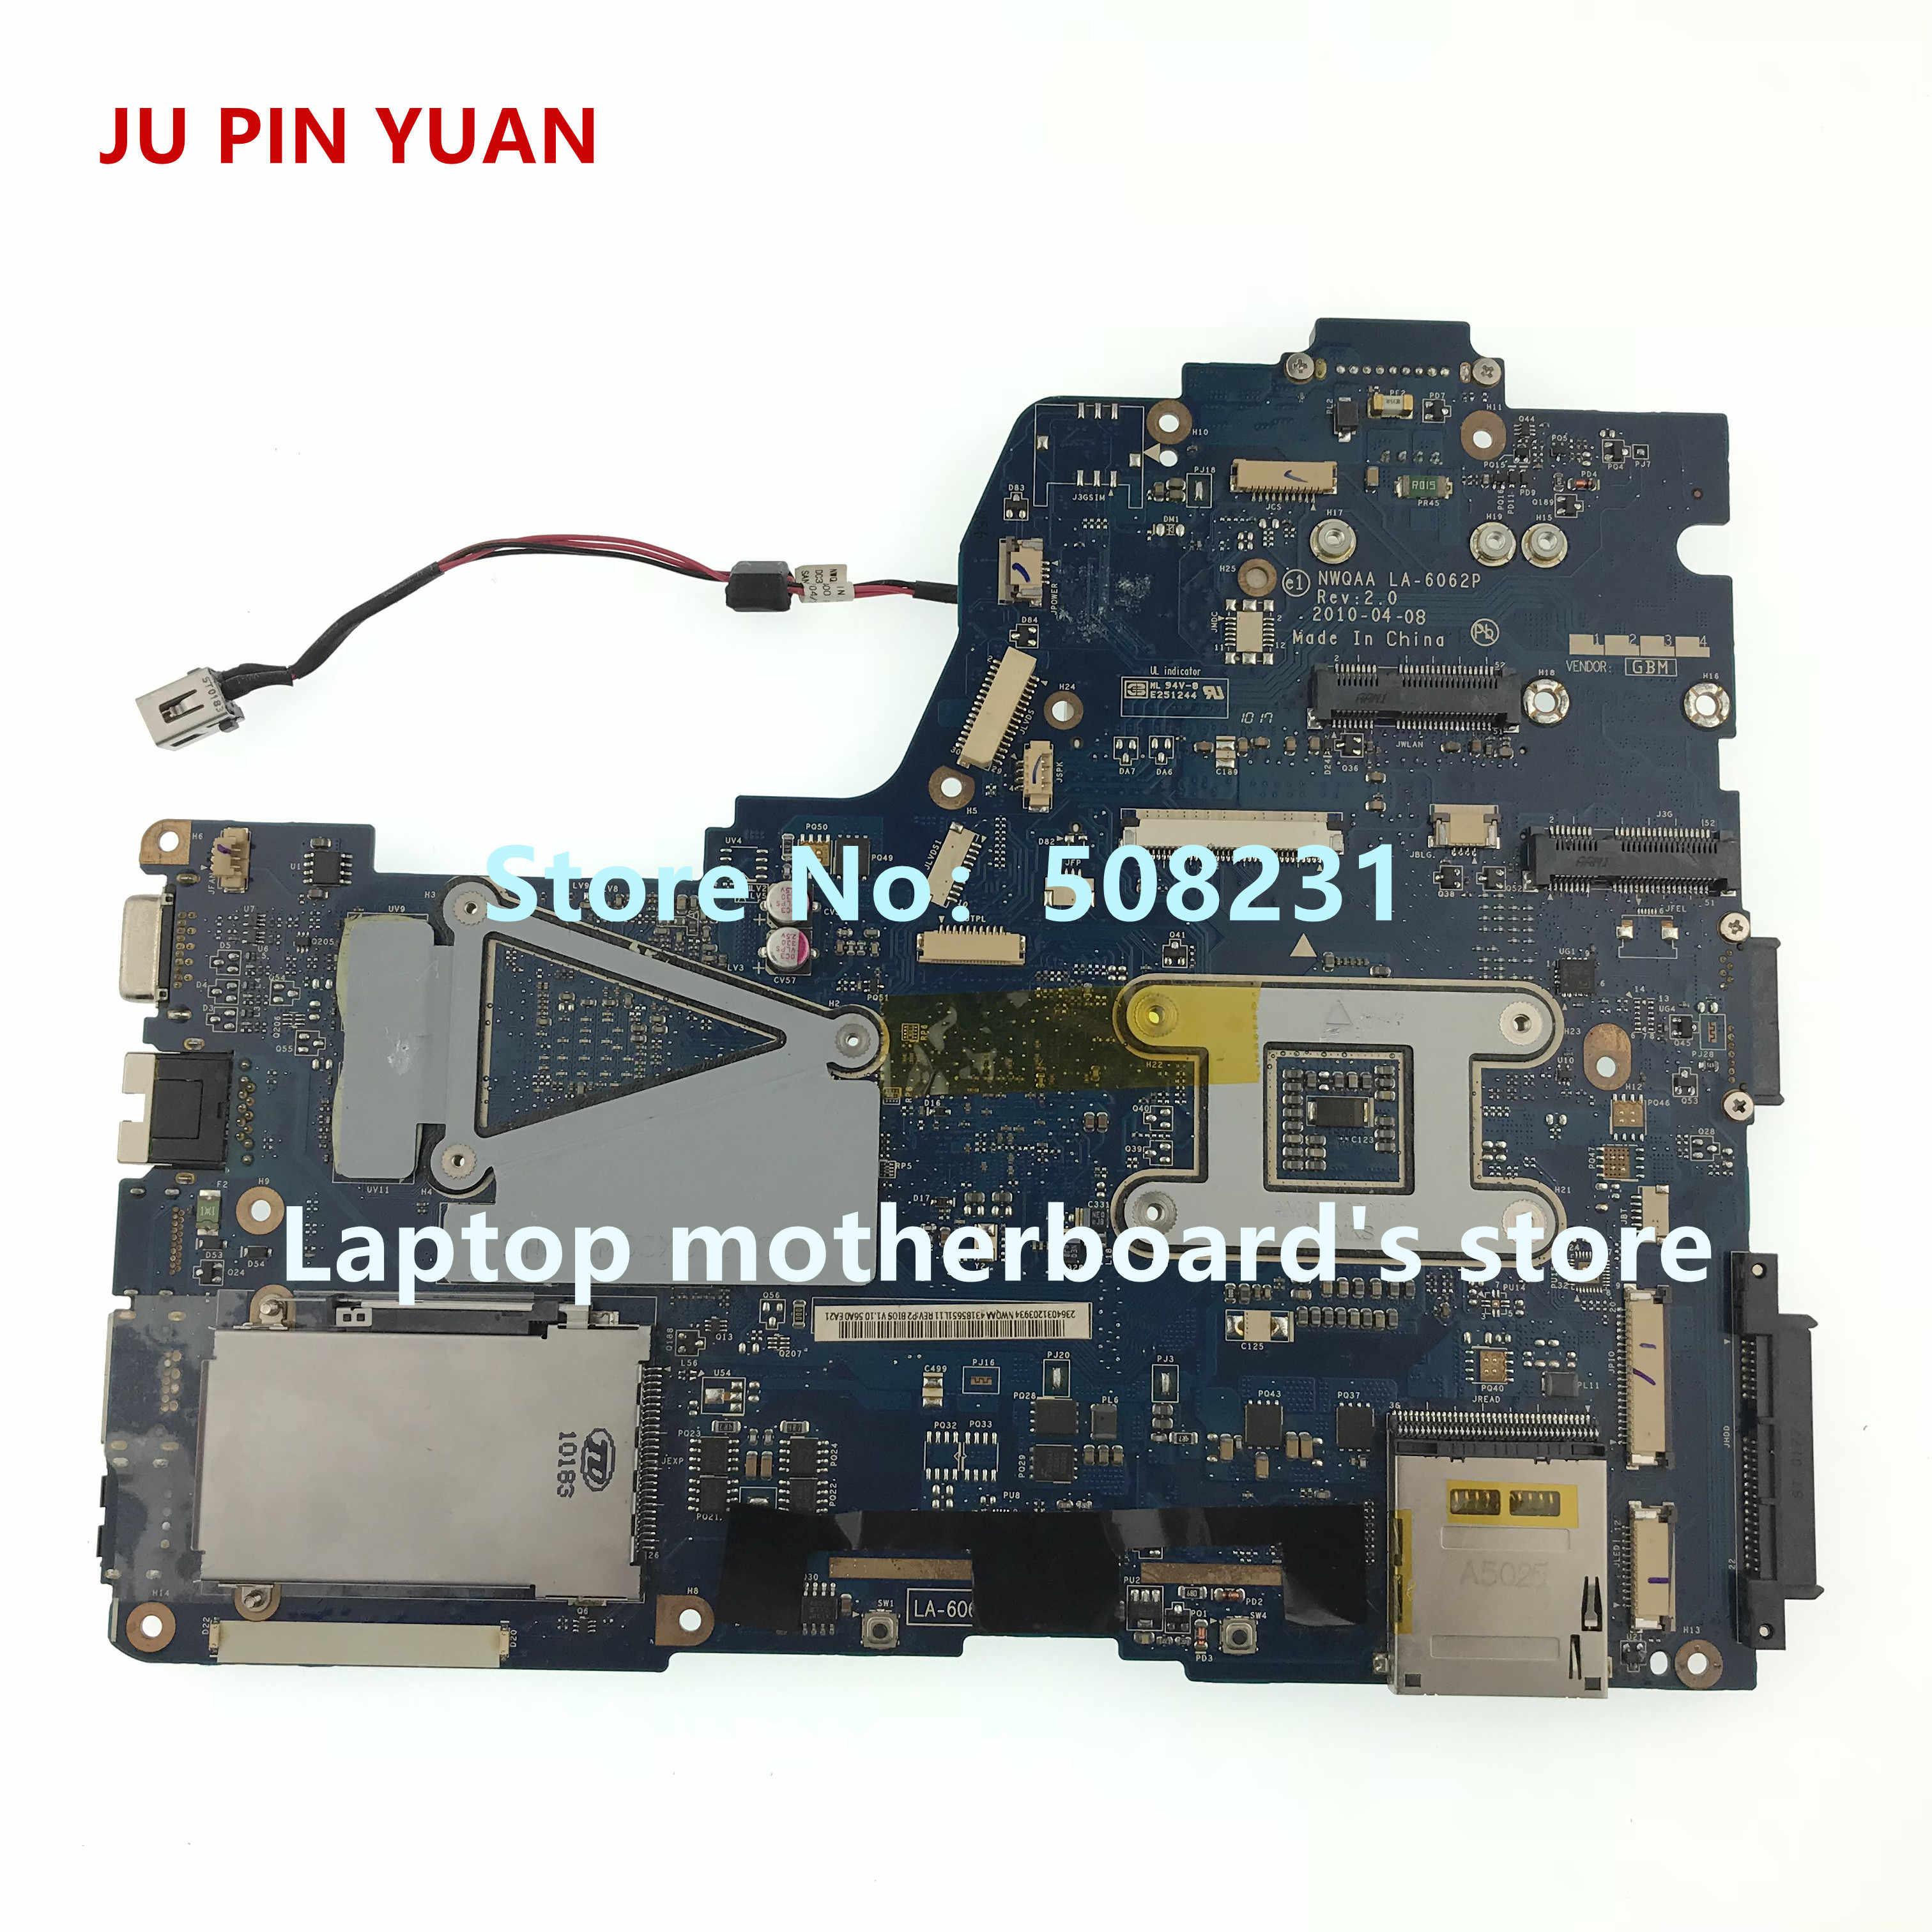 JU PIN юаней для Toshiba Satellite A660 A665 Тетрадь серийная материнская плата для ноутбука K000104390 LA-6062P полностью протестирована